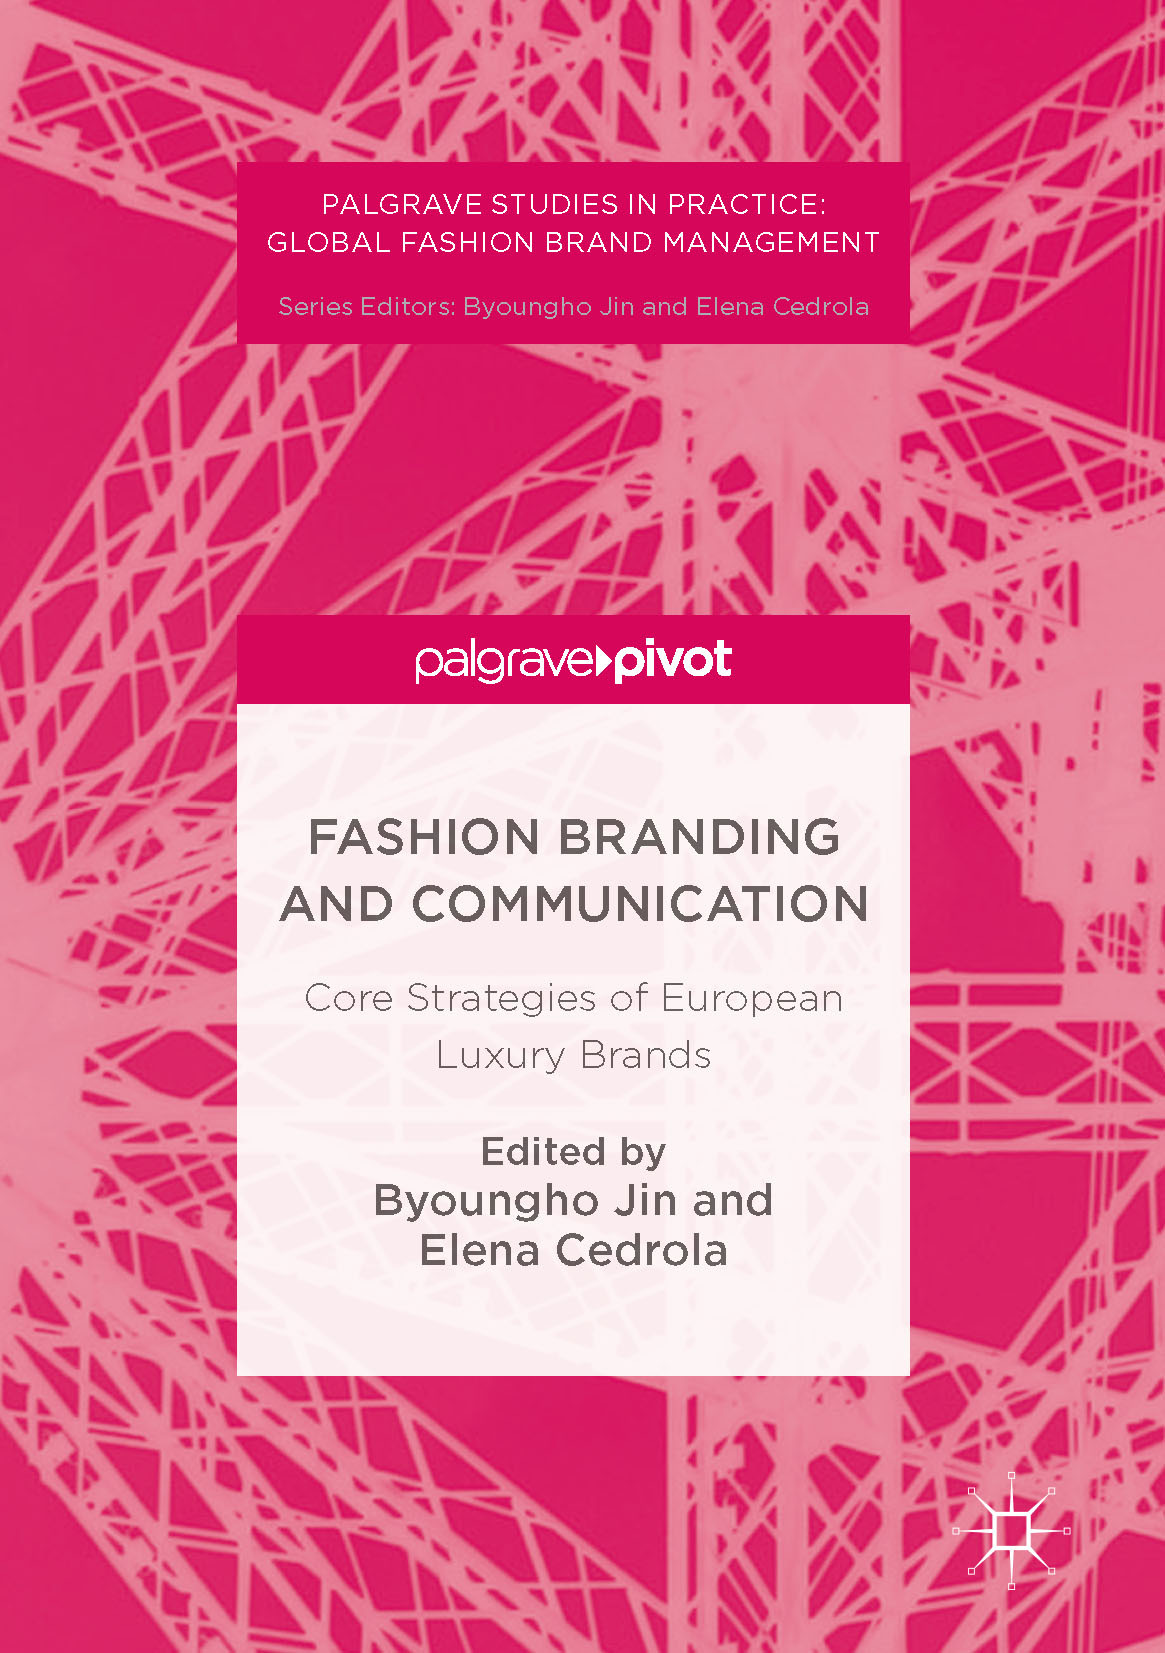 Cedrola, Elena - Fashion Branding and Communication, ebook